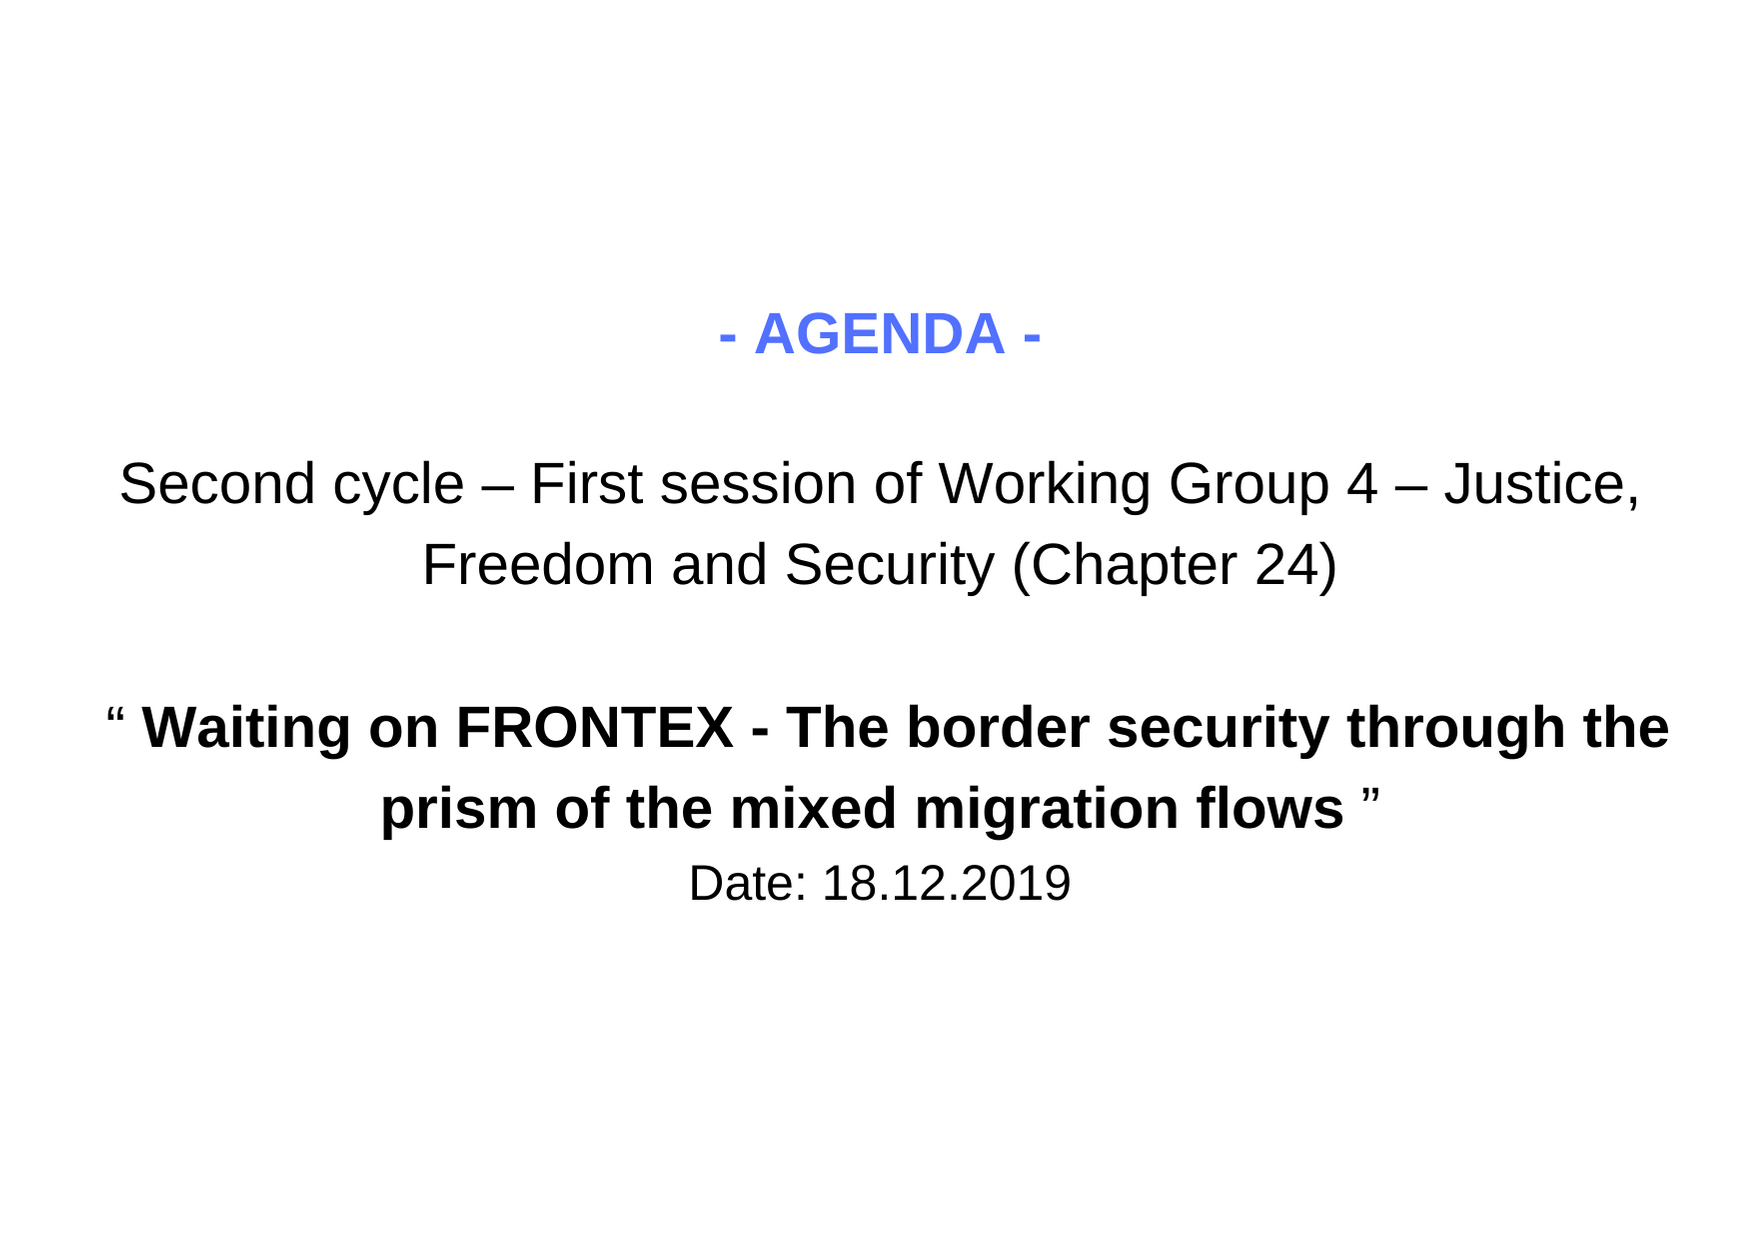 Agenda WG4 1 session 2 cycle